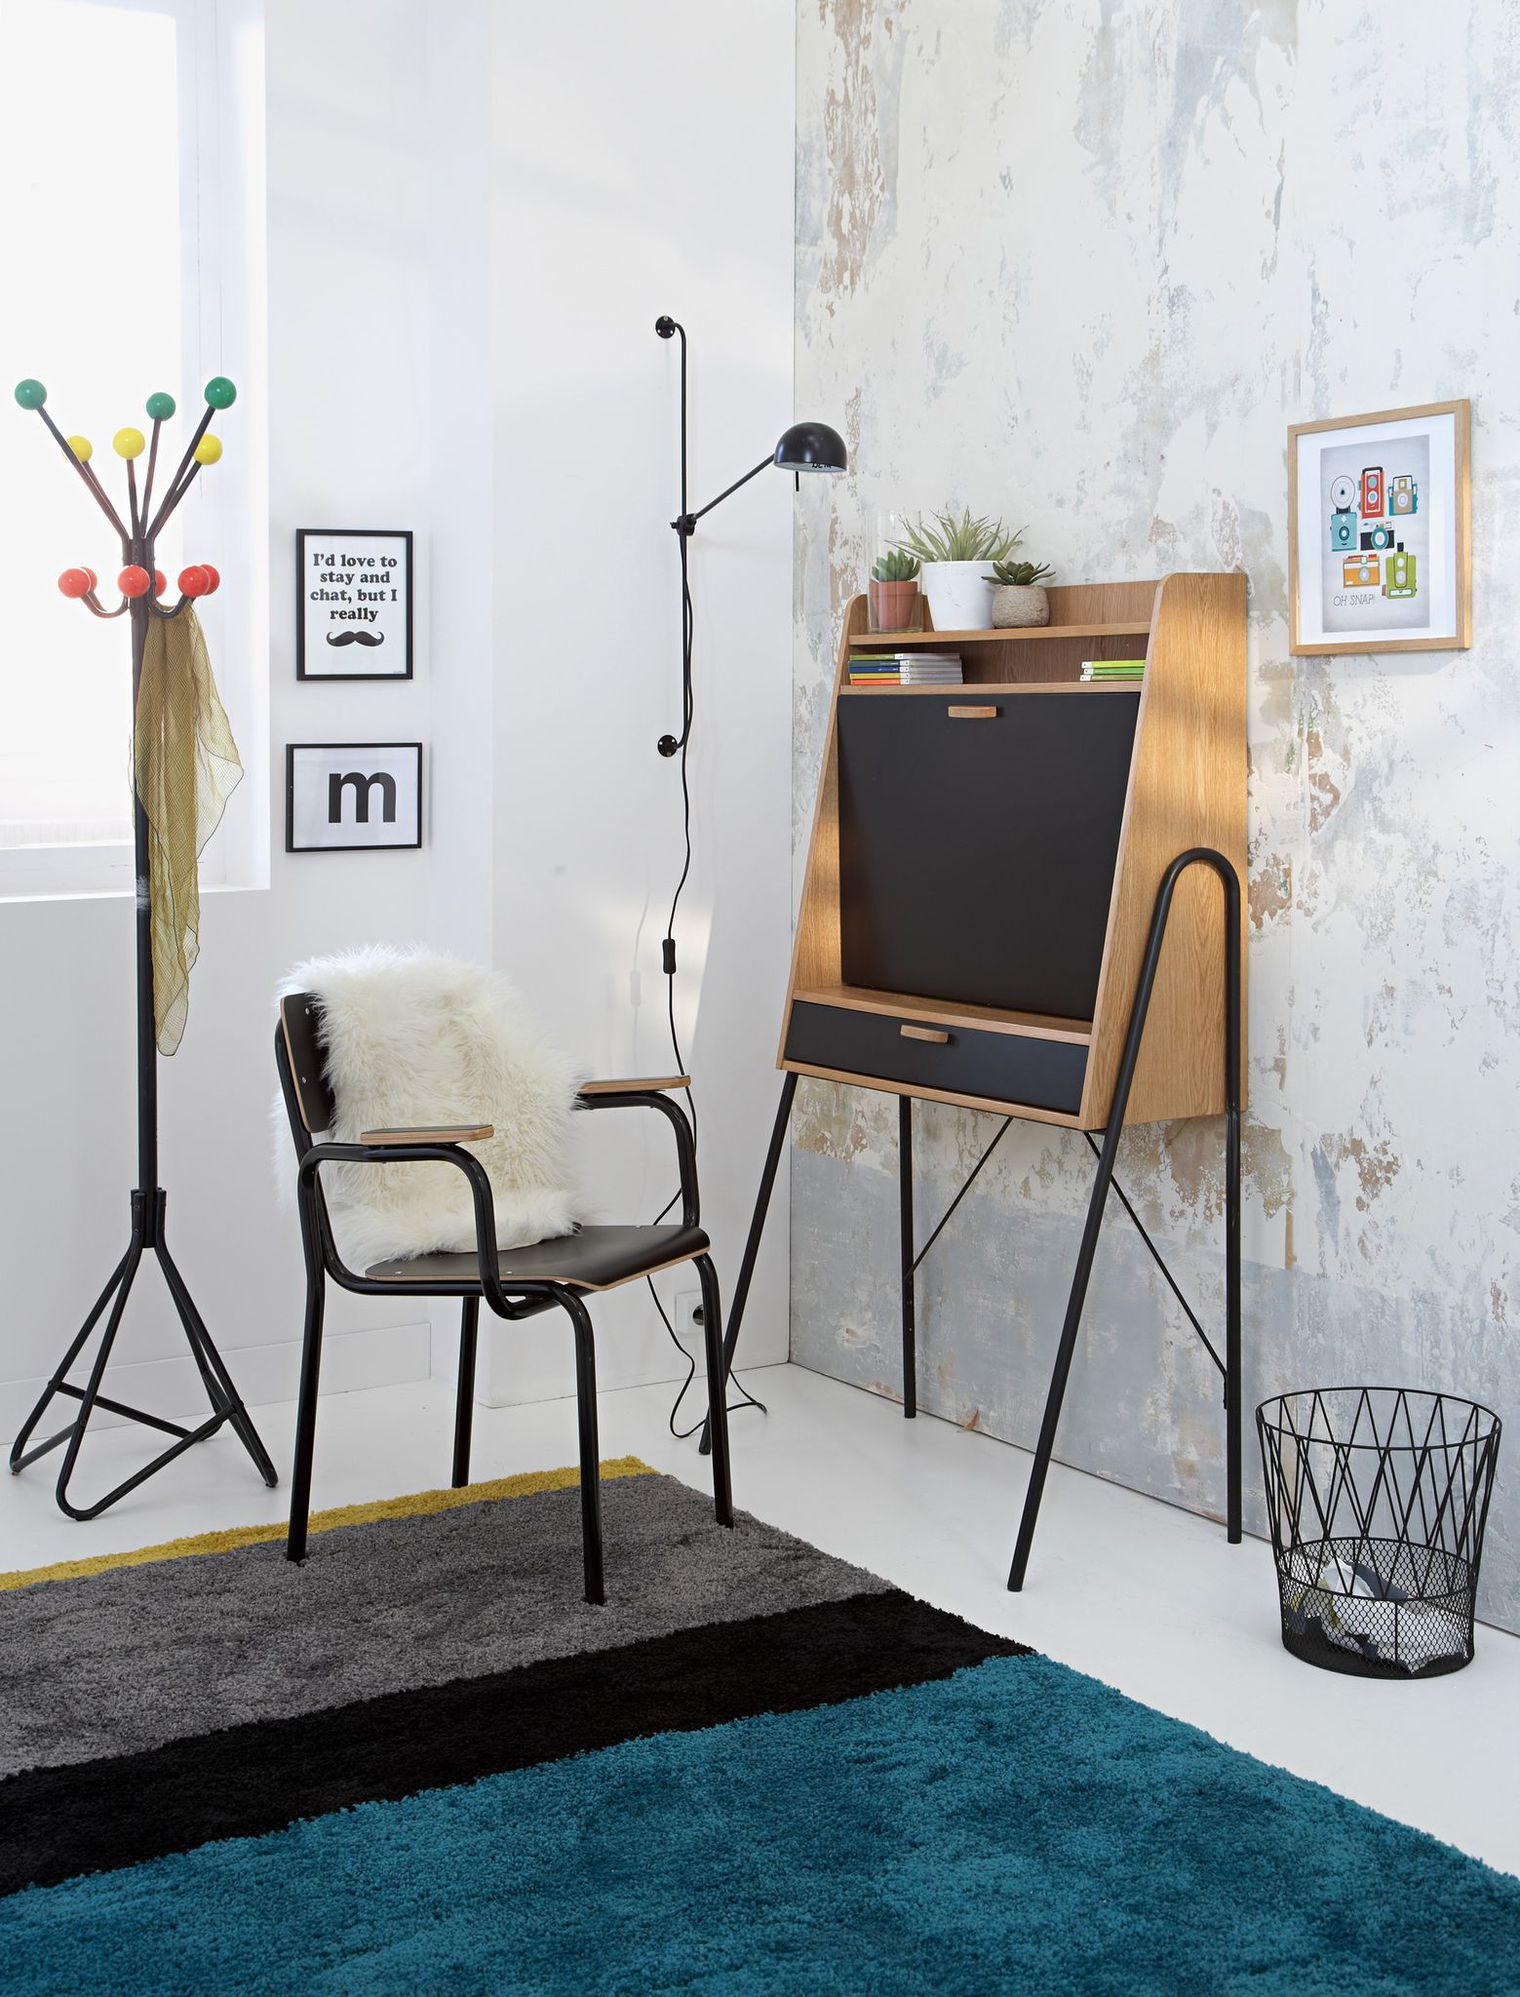 Мебель для комнаты: секретер для кабинета